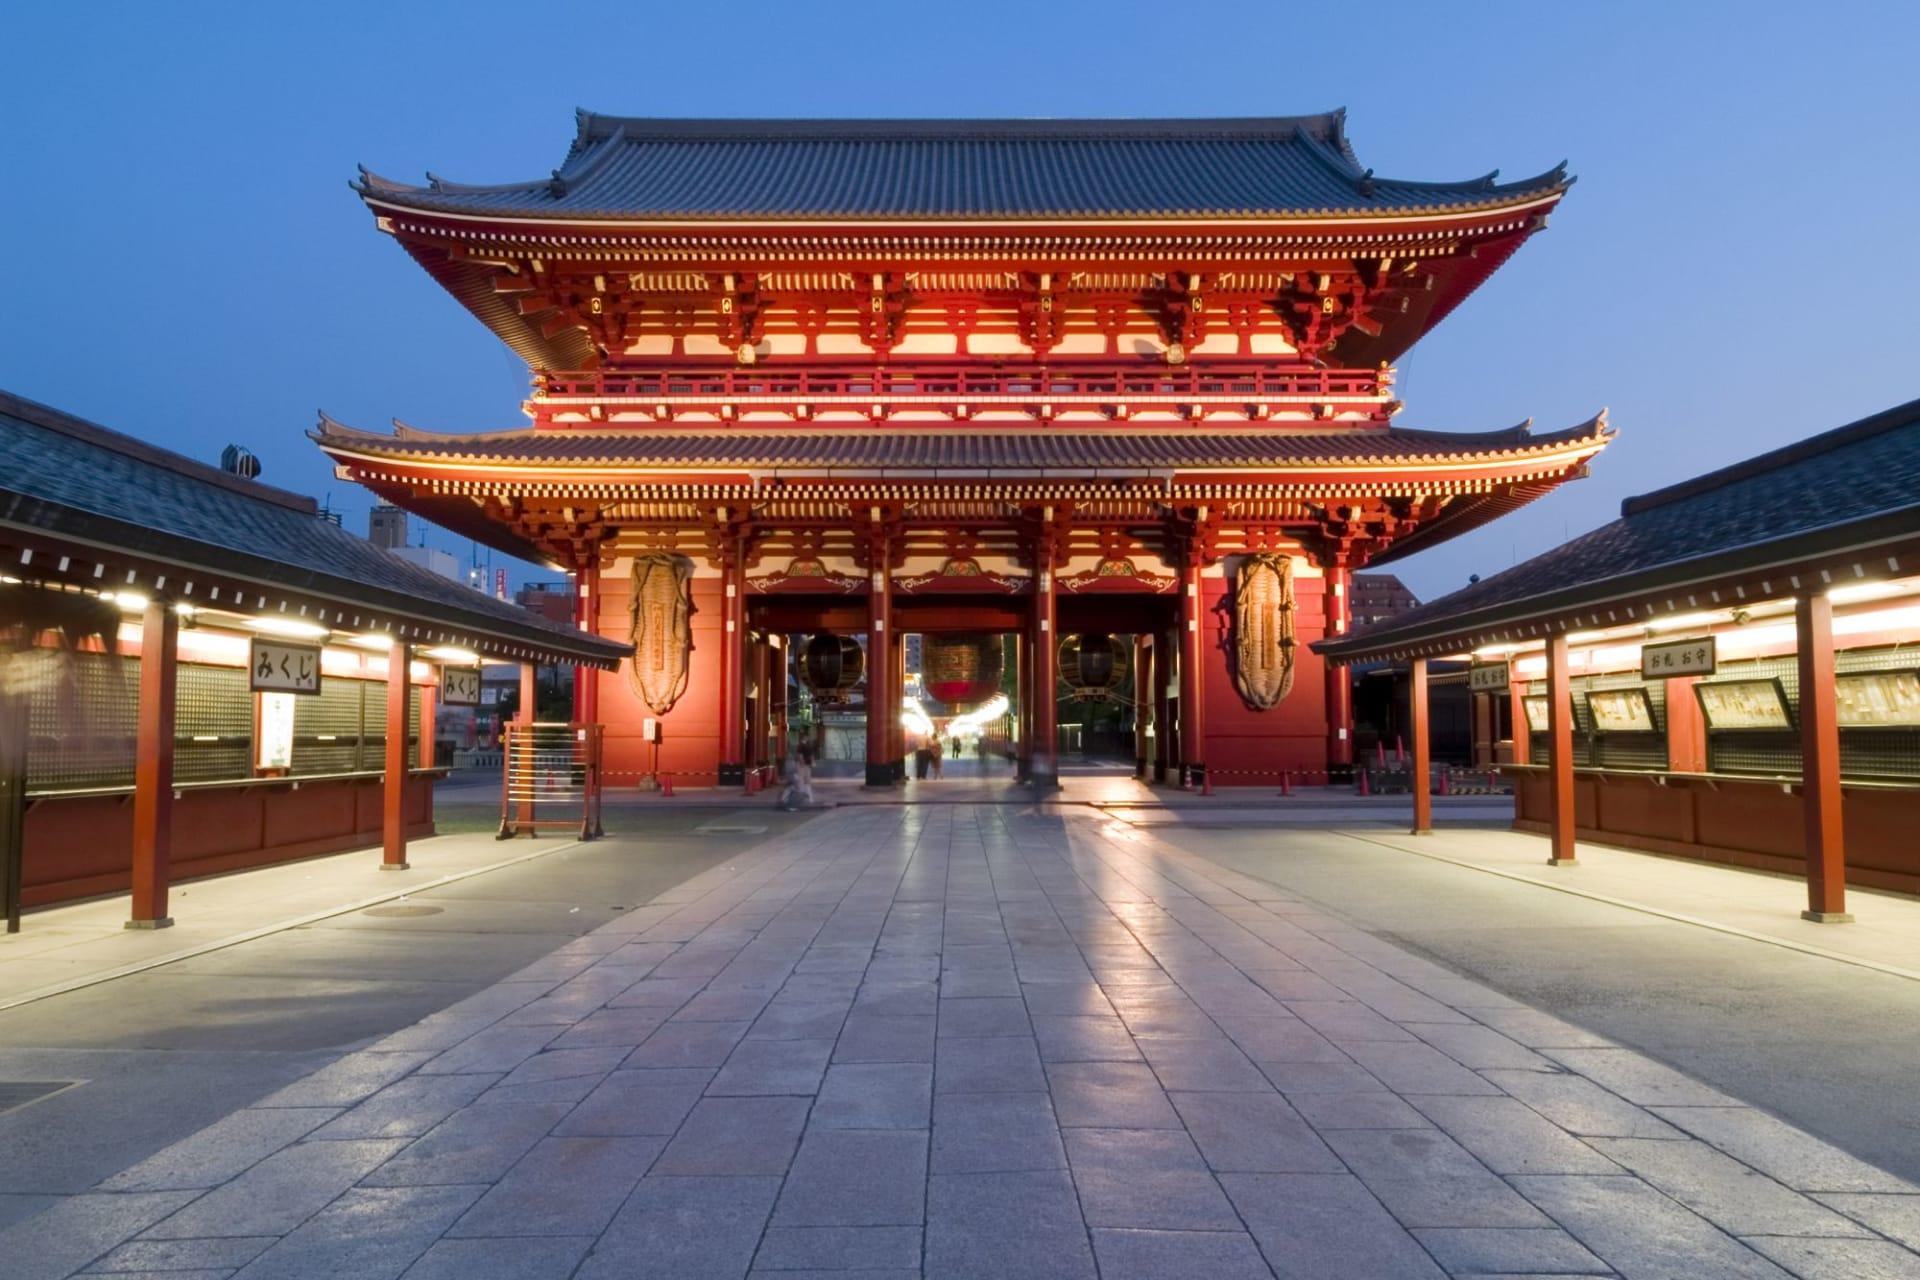 Senso-ji (Kannon) Temple Asakusa